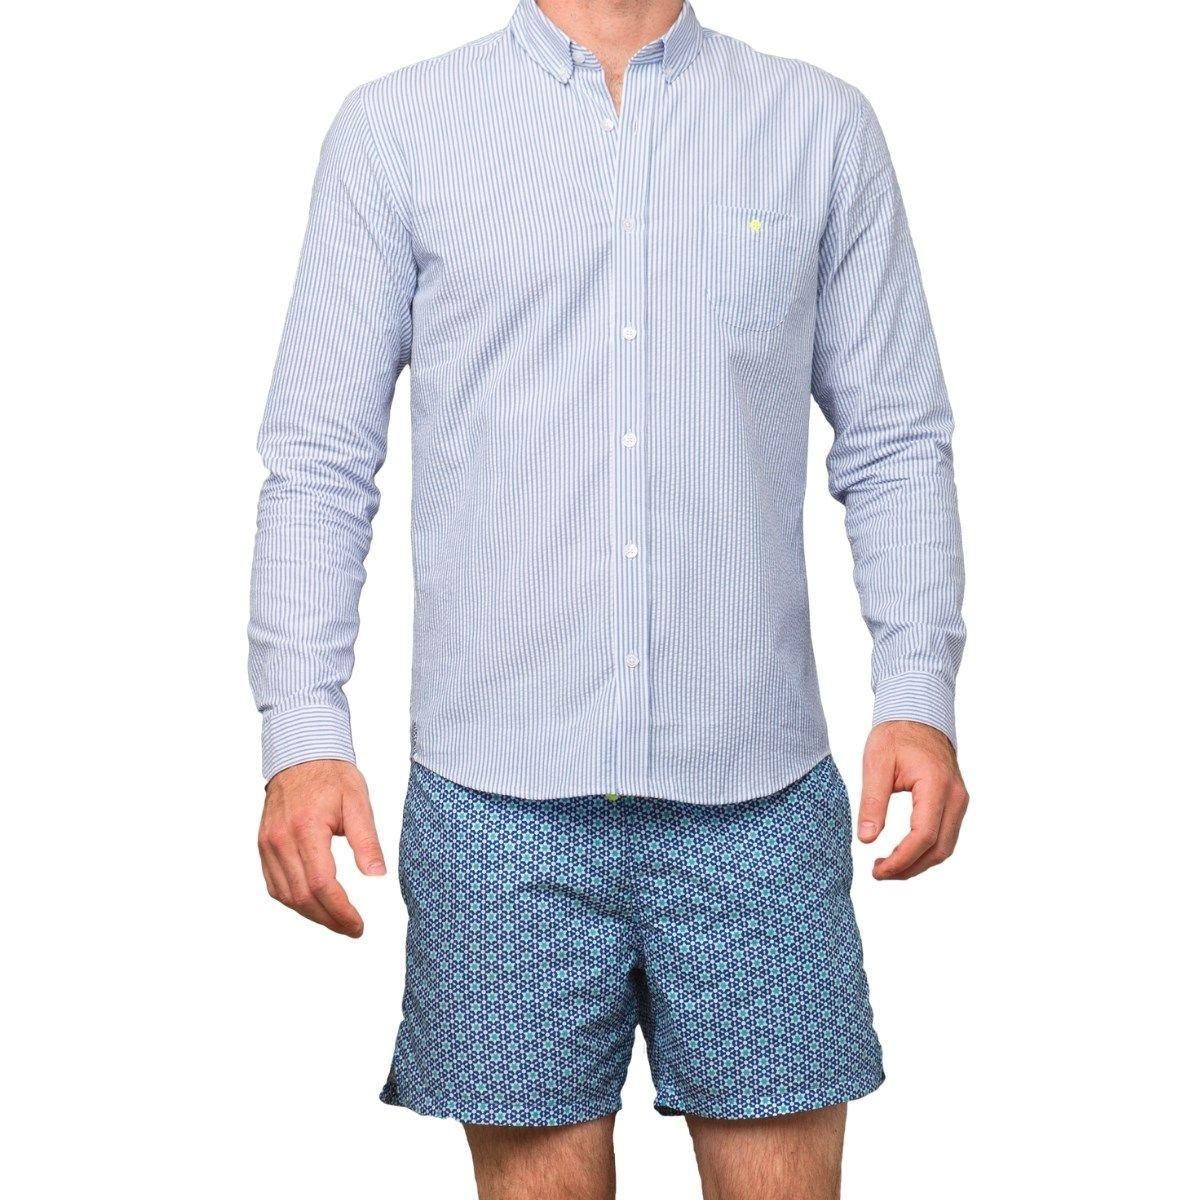 Chemise bleu à motif seersucker